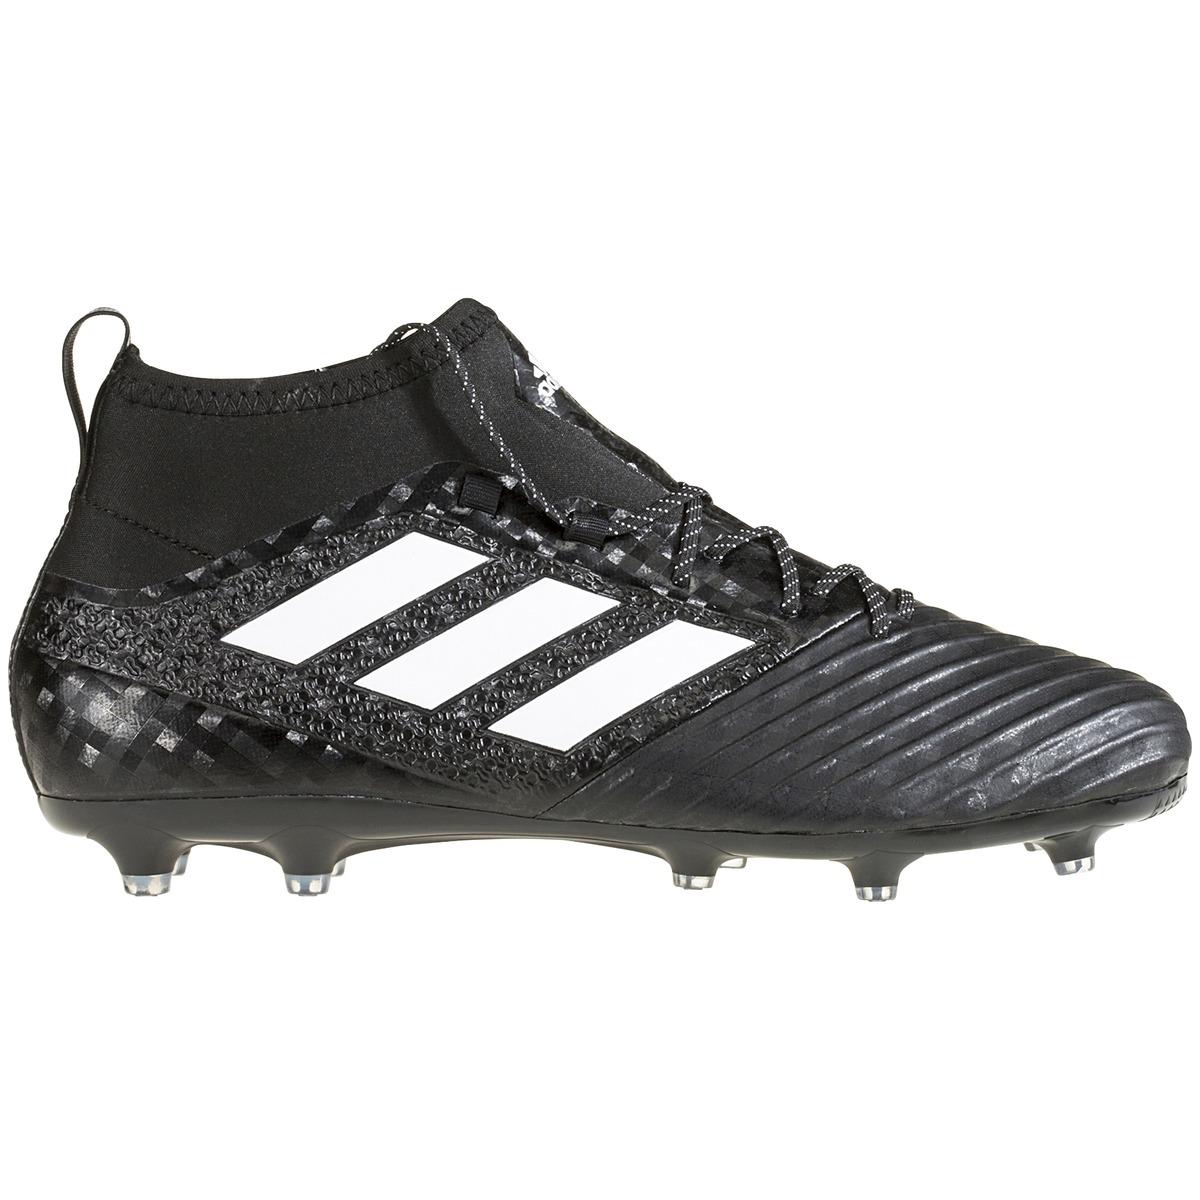 quality design 97471 28c10 adidas ace 17.2 primemesh fg ag q1 17 fotbollssko senior fotbollsskor